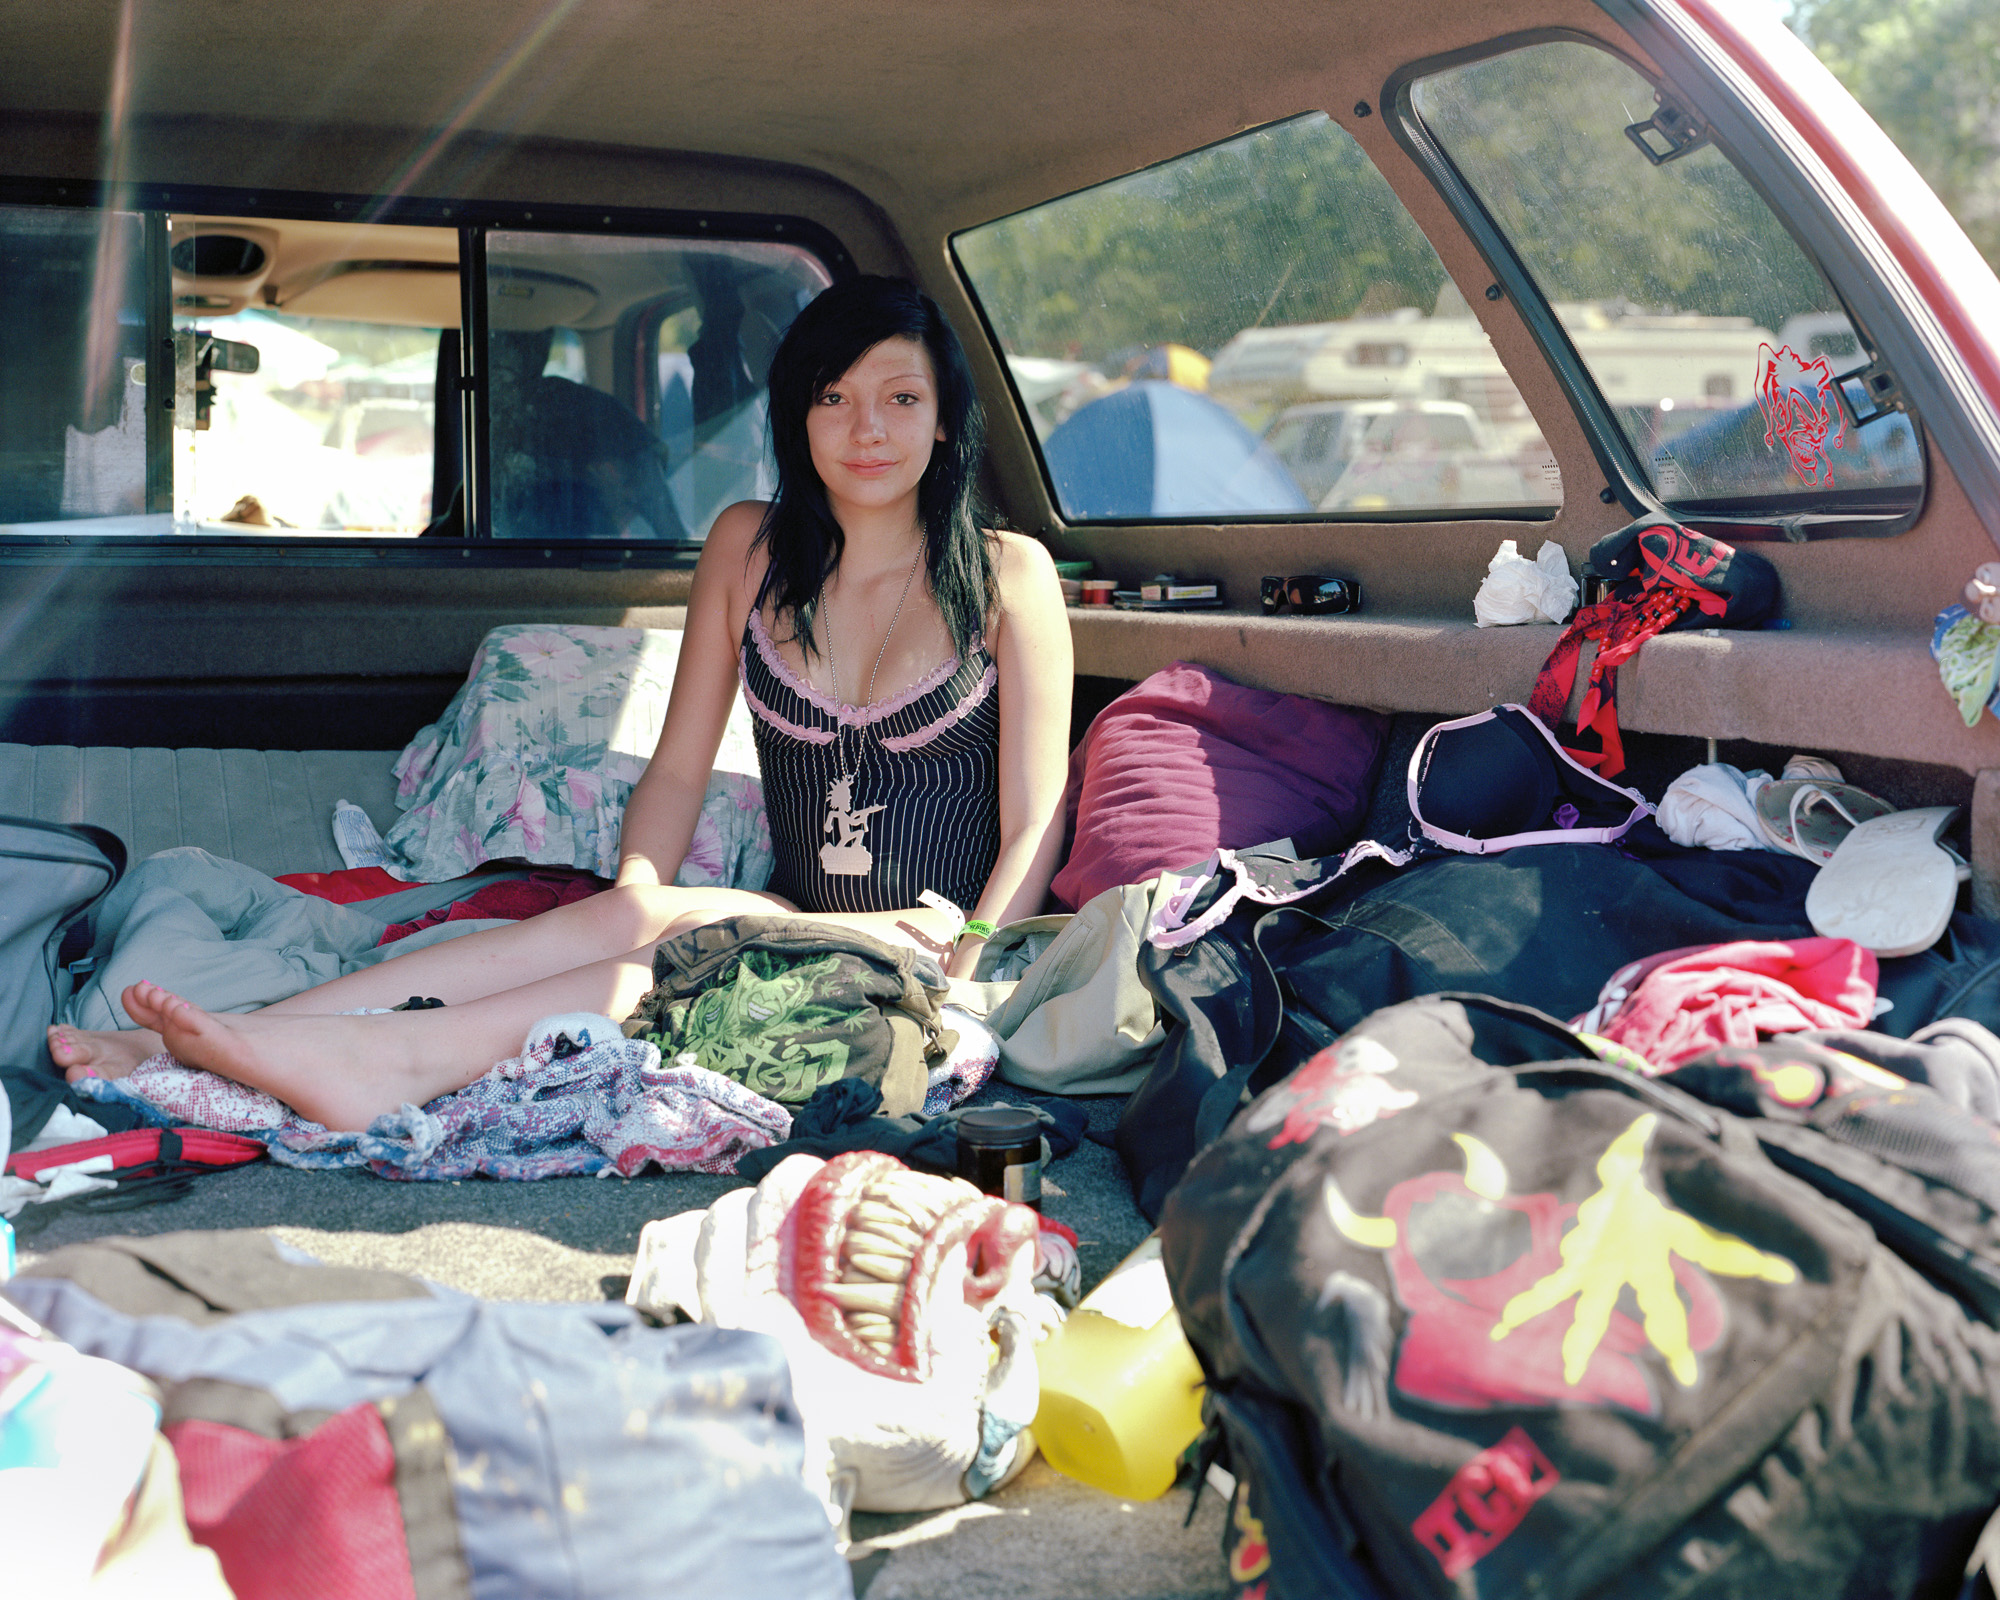 truck_girl_final.jpg